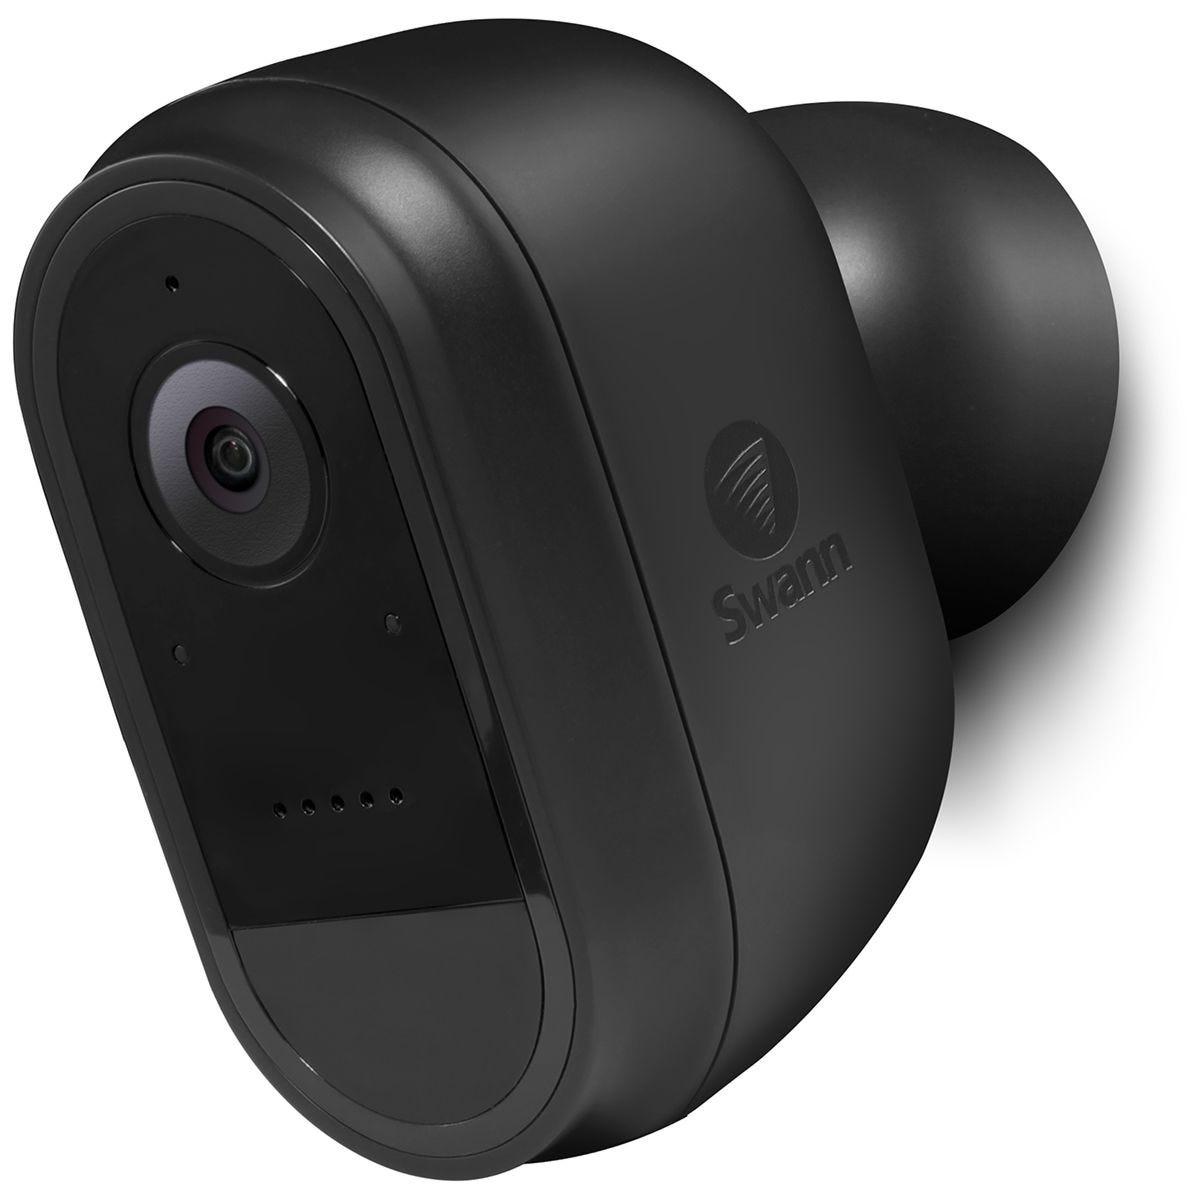 Swann Smart Wire-Free 1080p CCTV Security Camera - Black